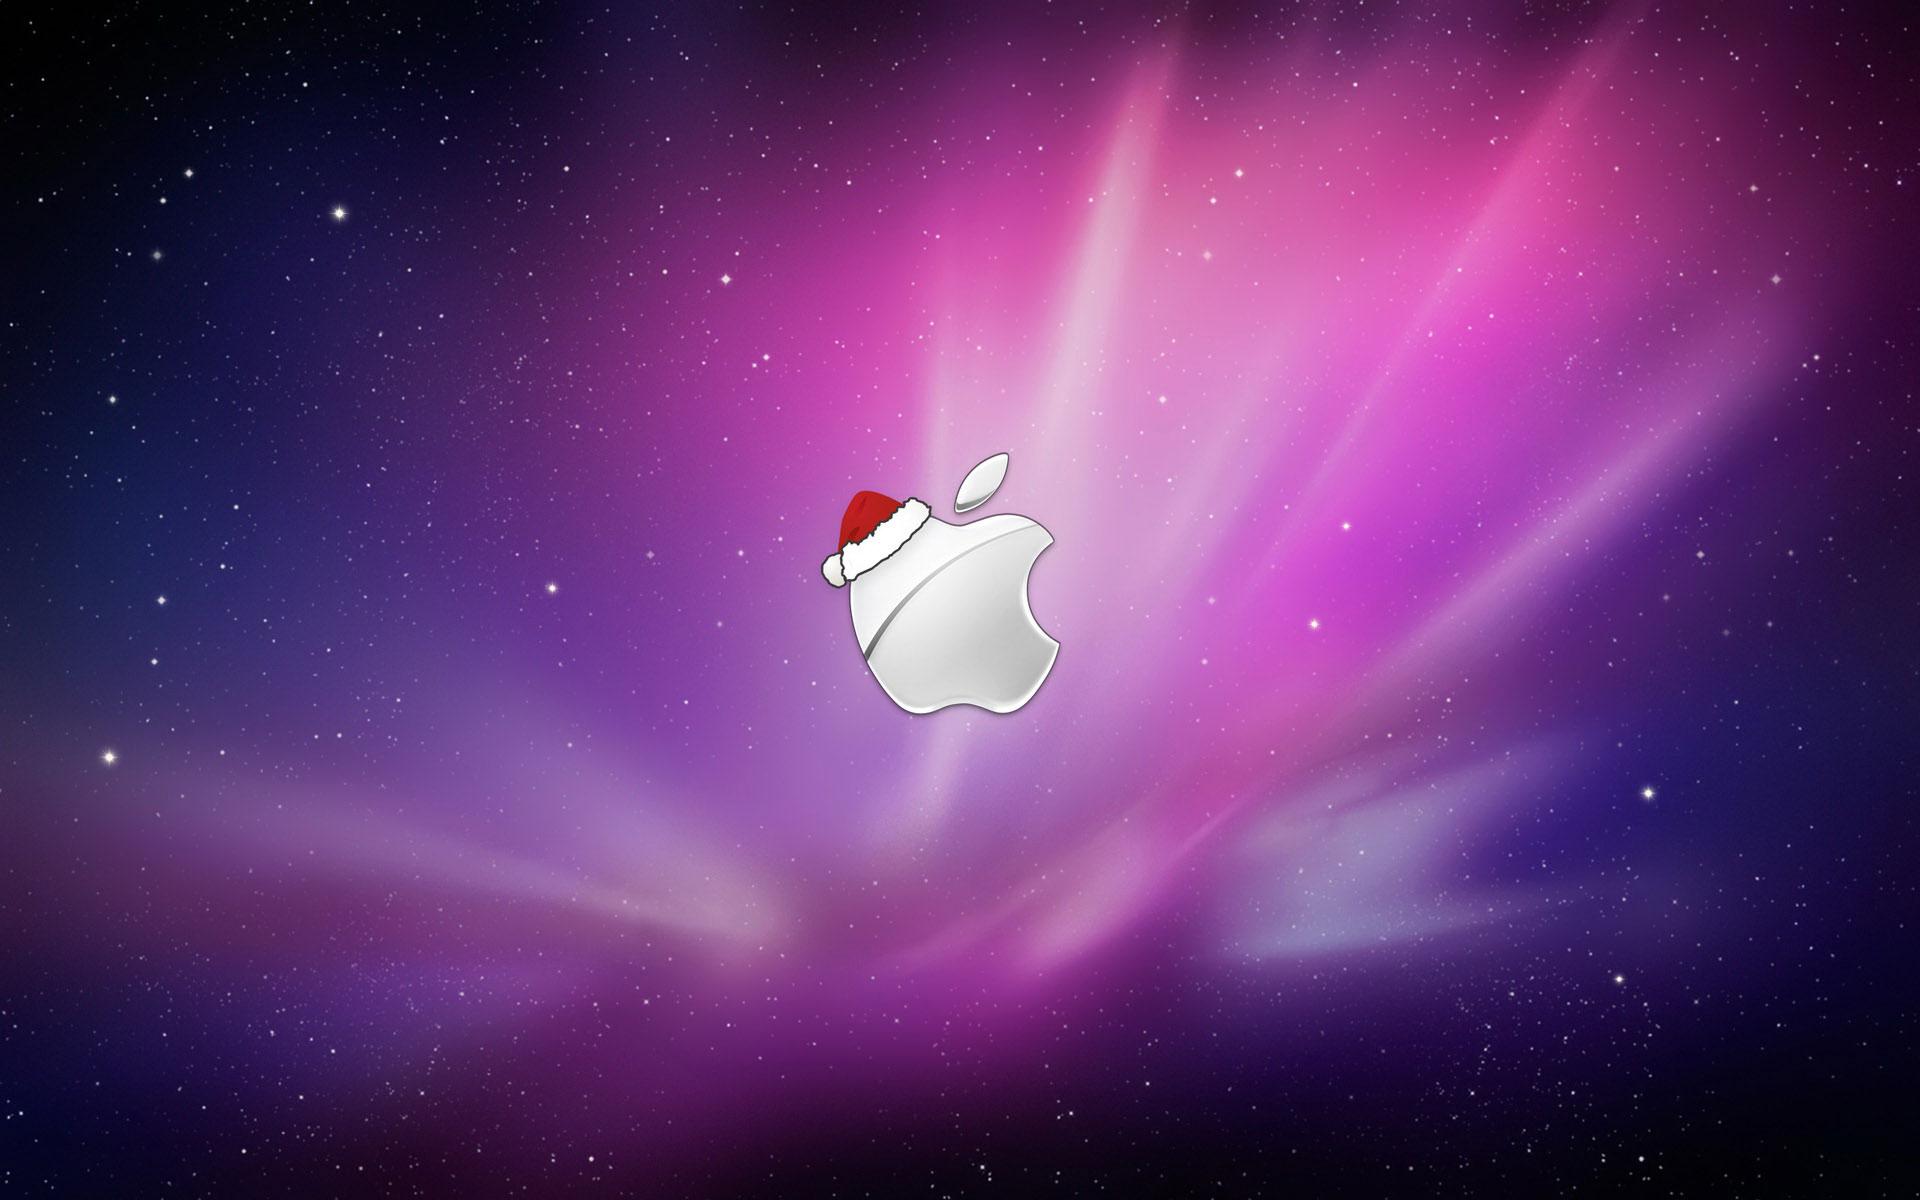 christmas desktop for mac wallpaper christmas desktop for mac hd 1920x1200